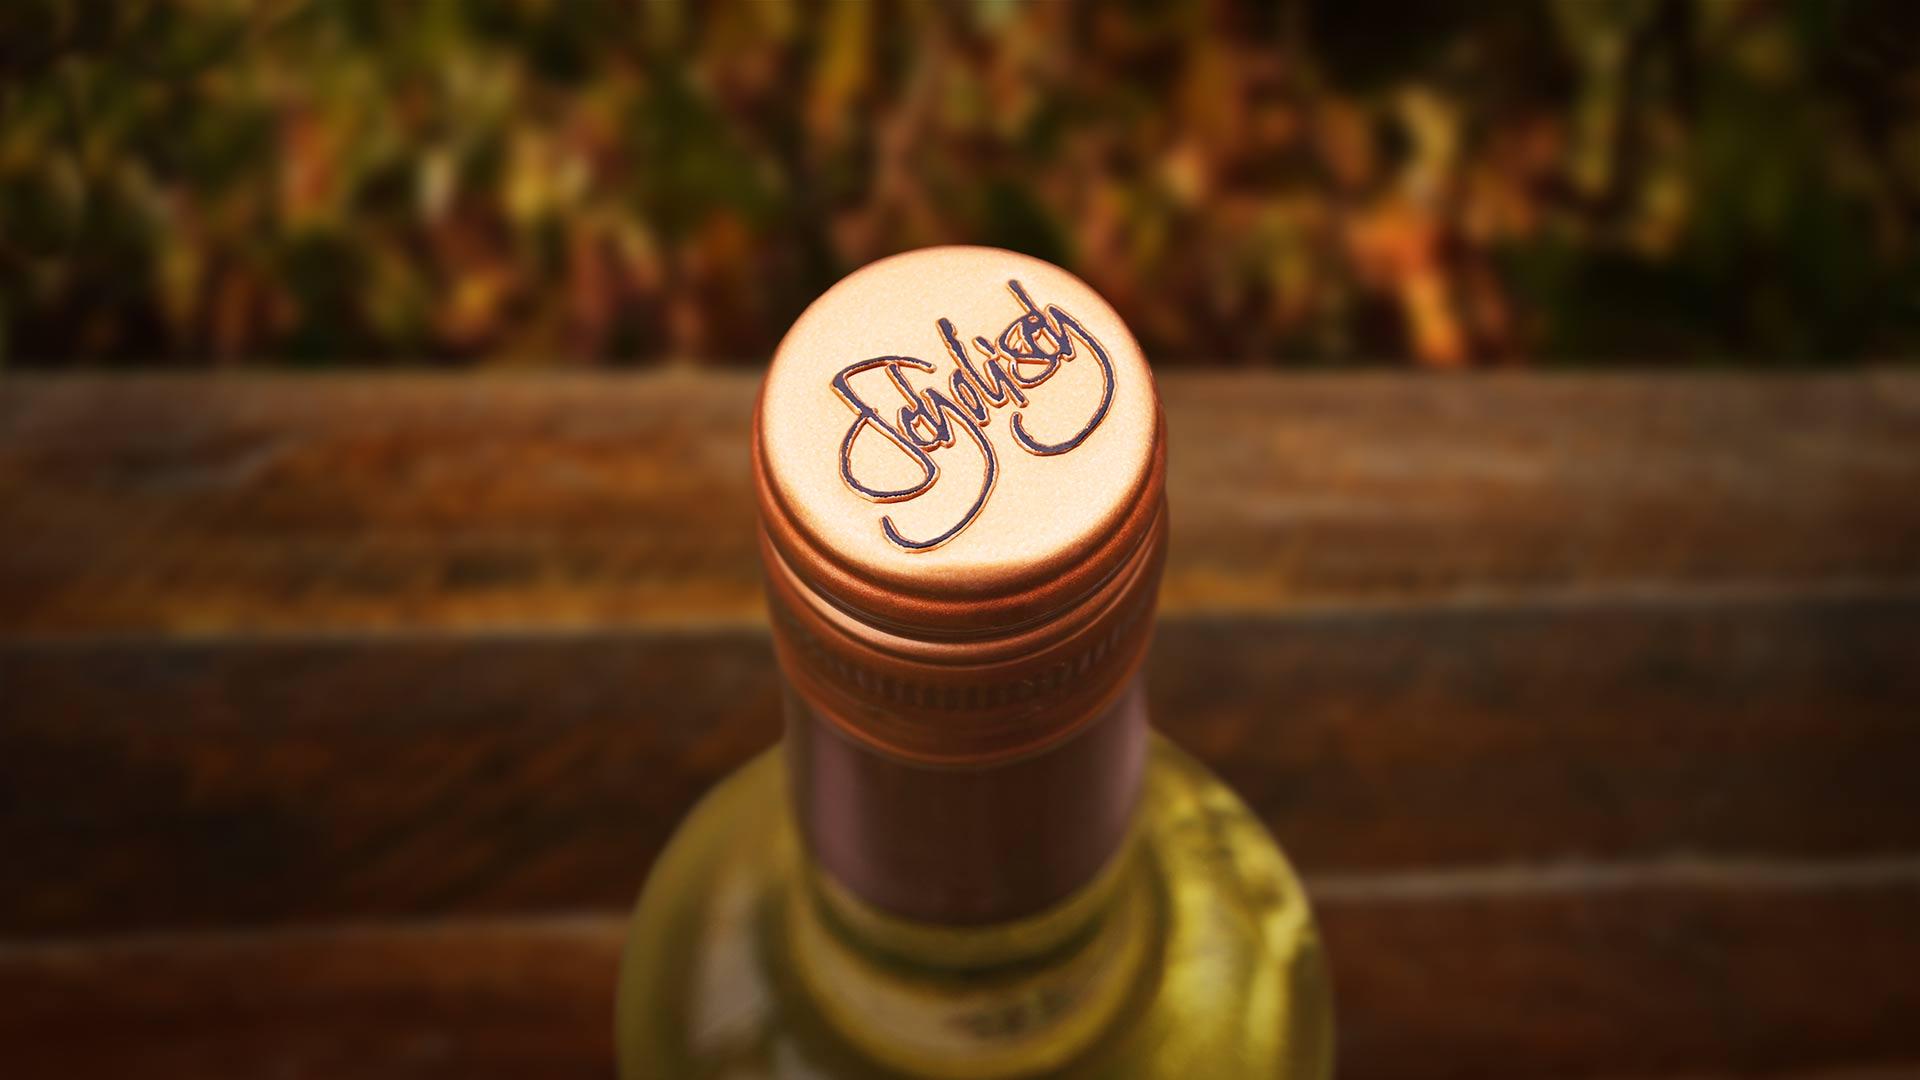 Scholisch-Flasche